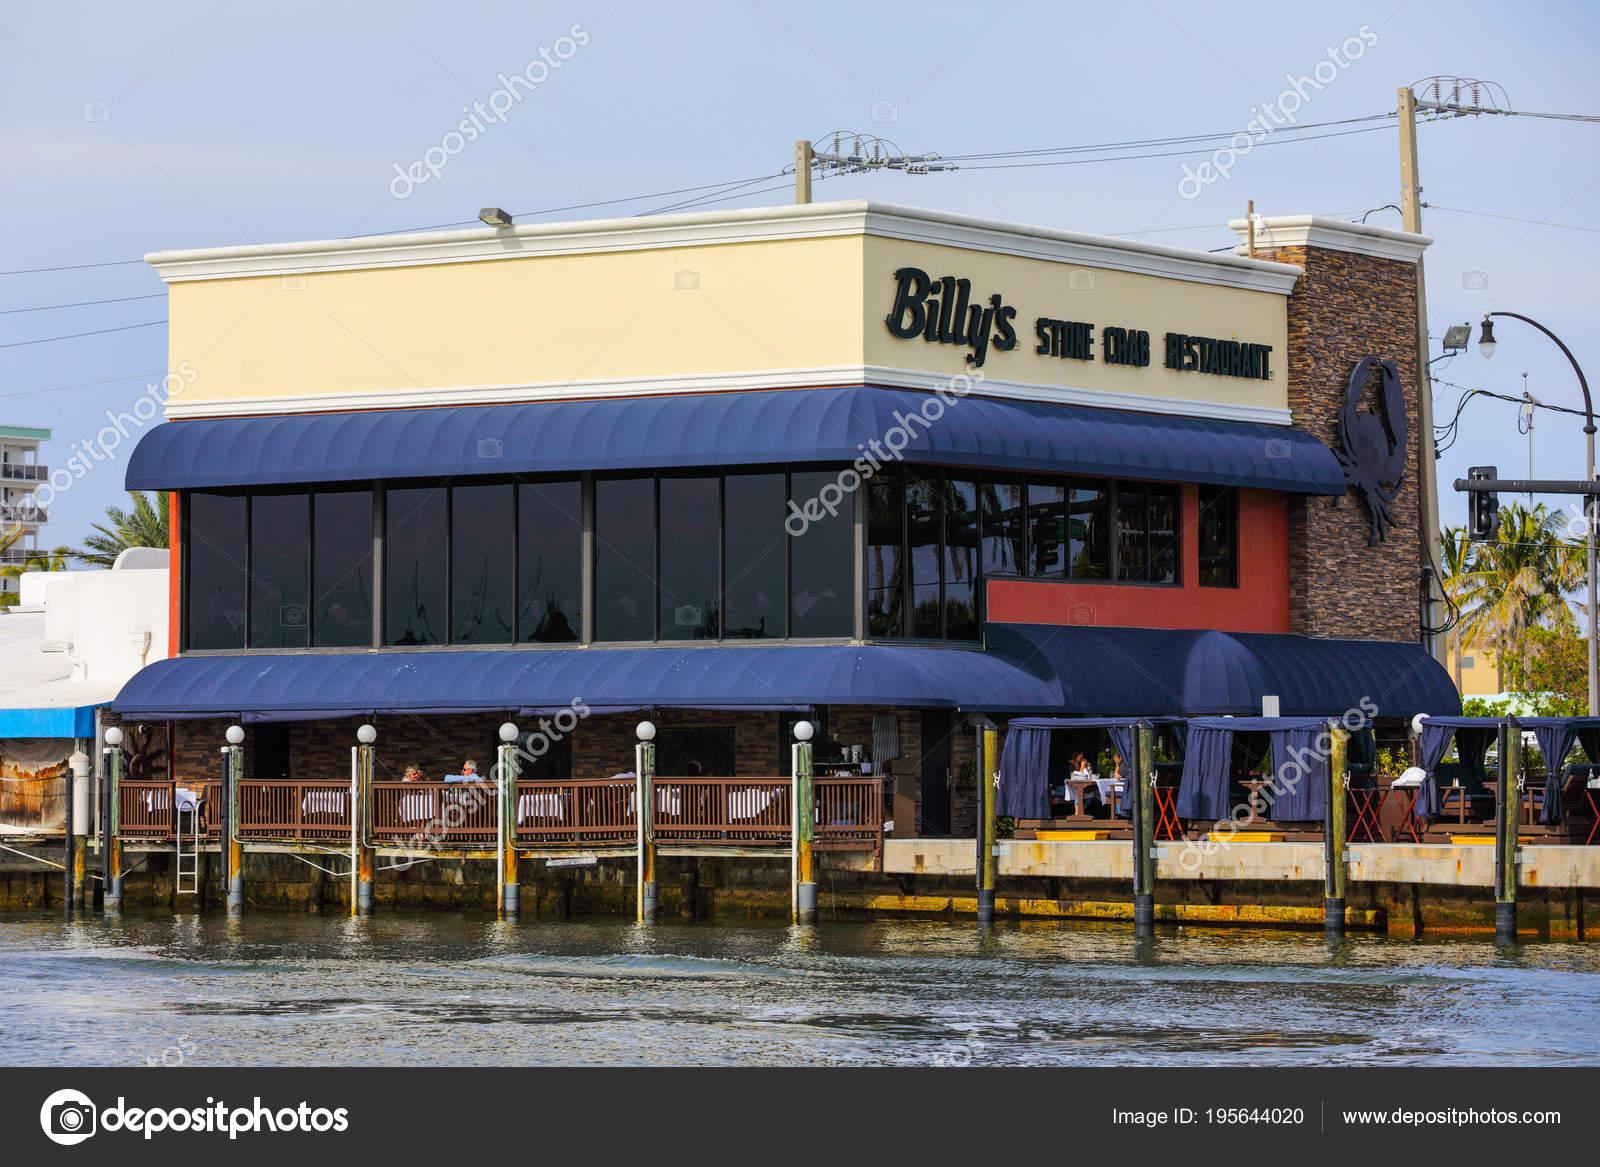 Billys Stone Cram Restaurant Hollywood Beach Florida Stock